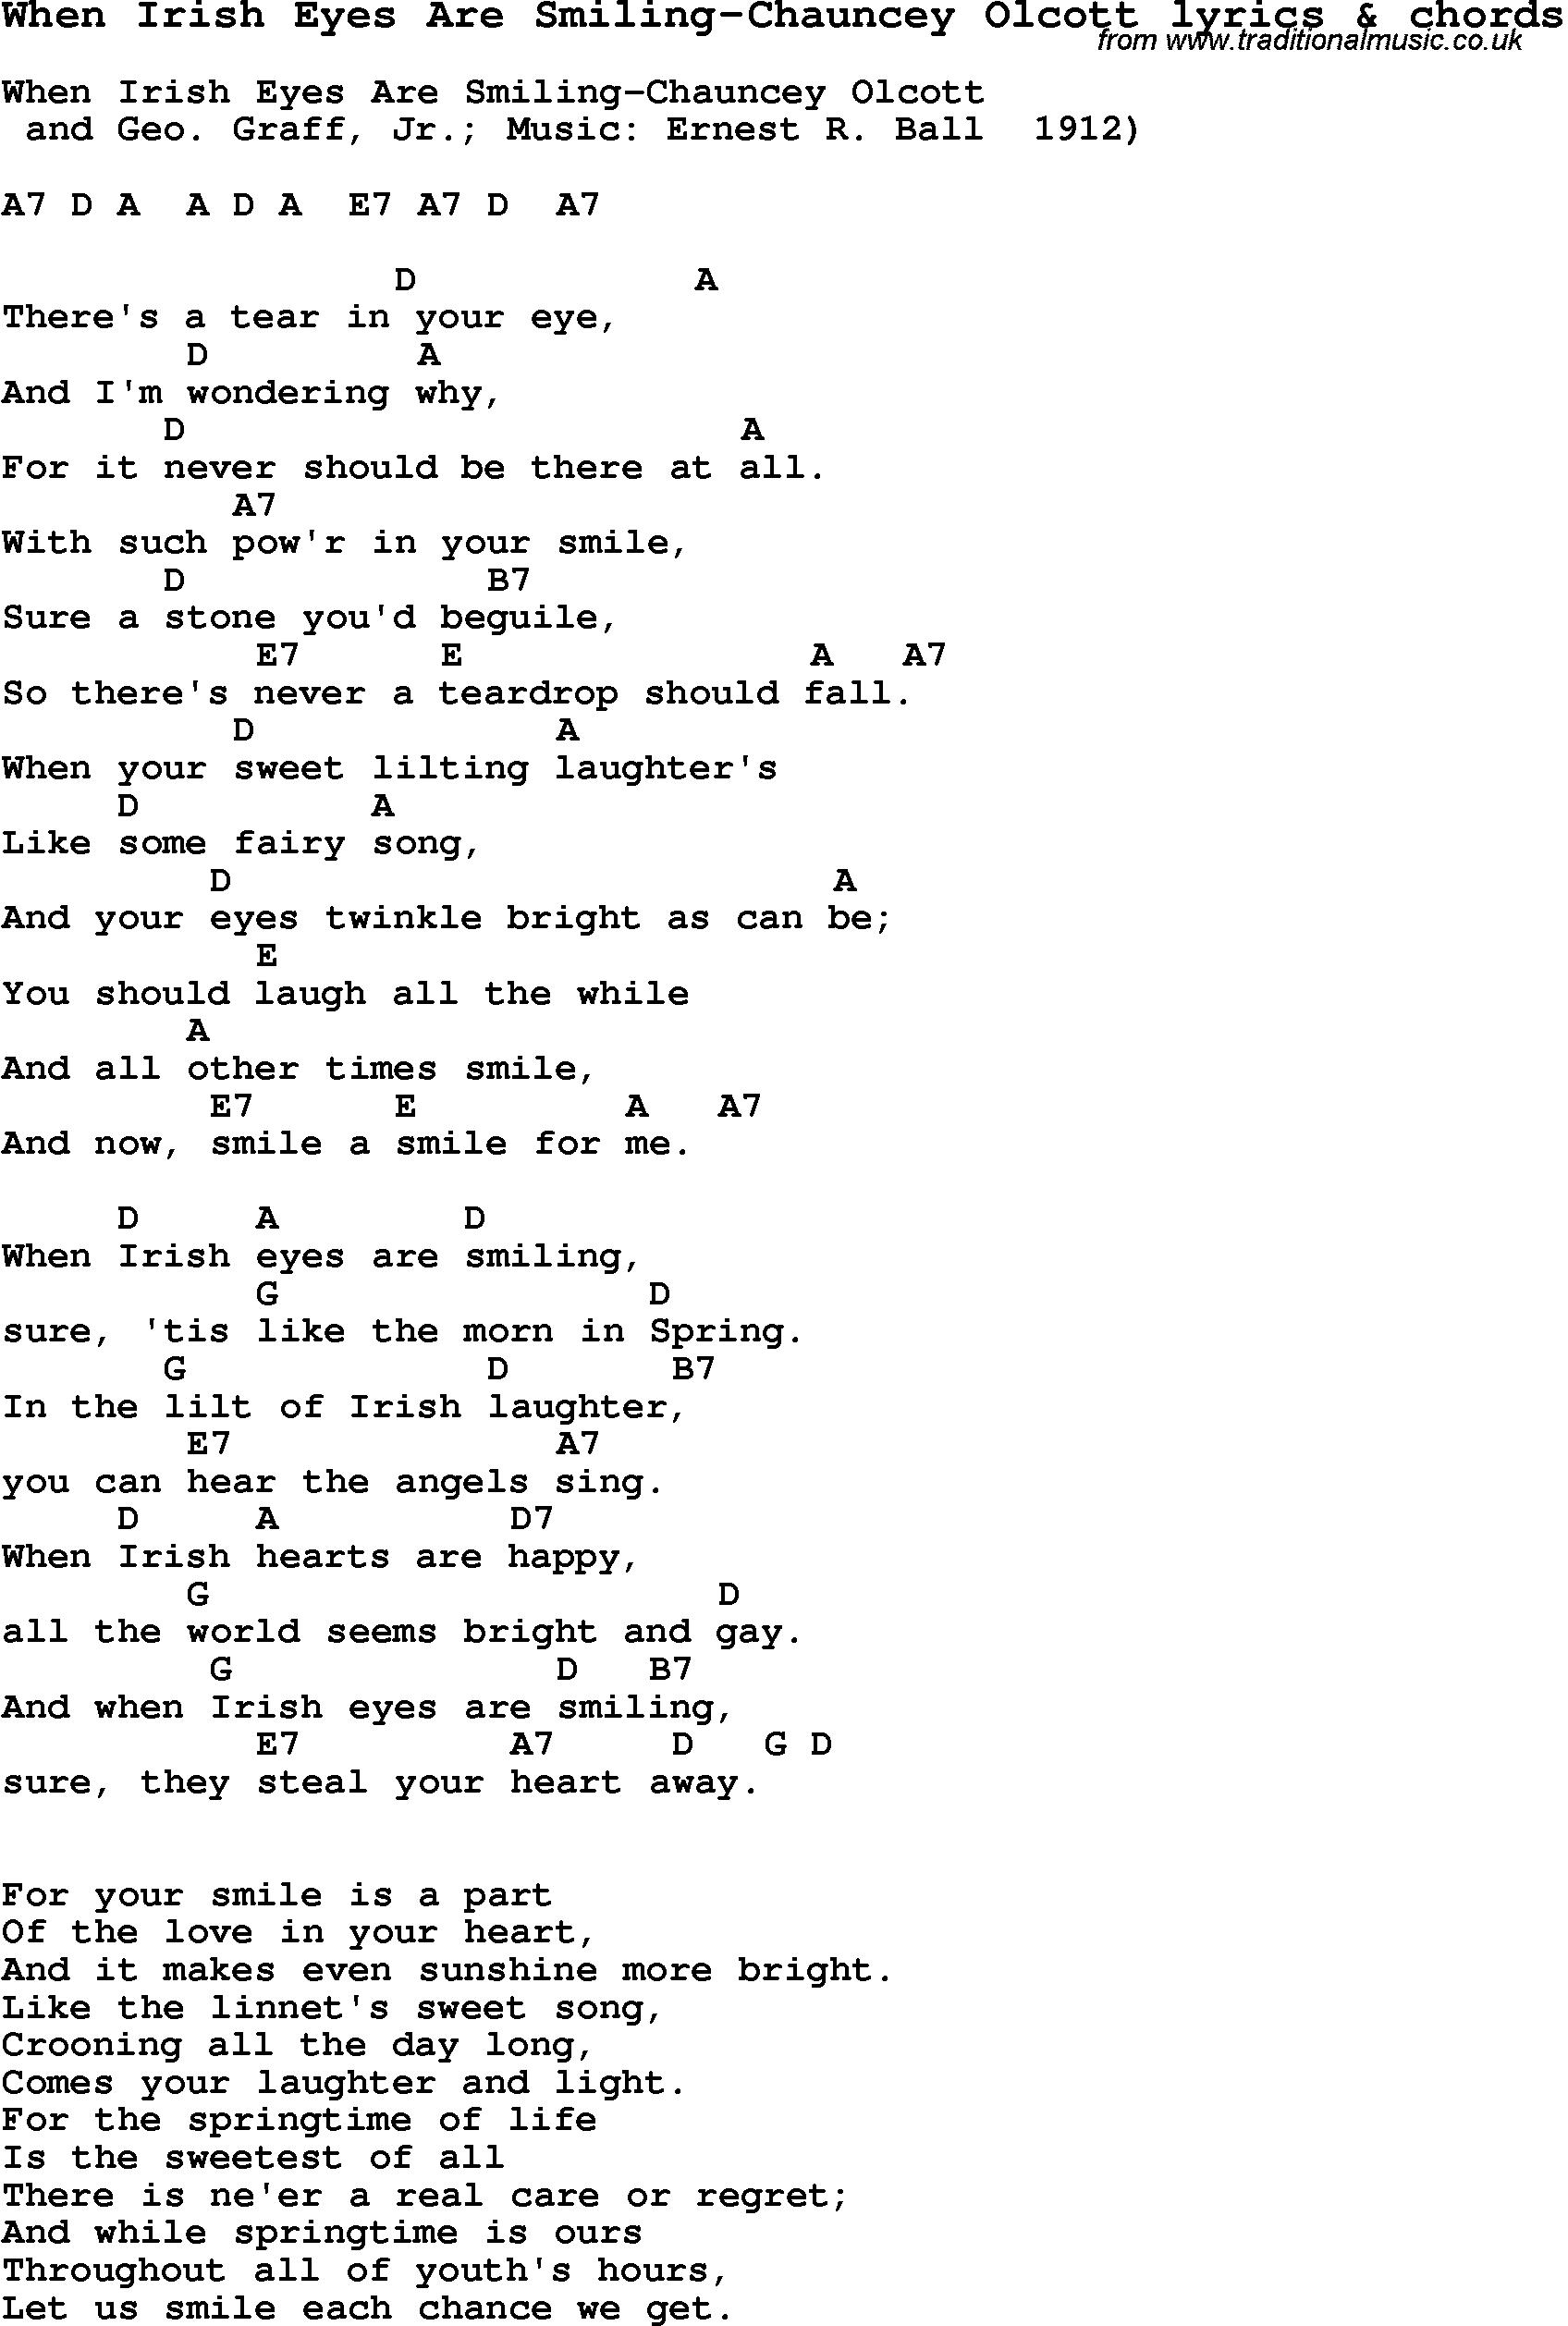 Love song lyrics for when irish eyes are smiling chauncey olcott love song lyrics for when irish eyes are smiling chauncey olcott with chords for hexwebz Choice Image